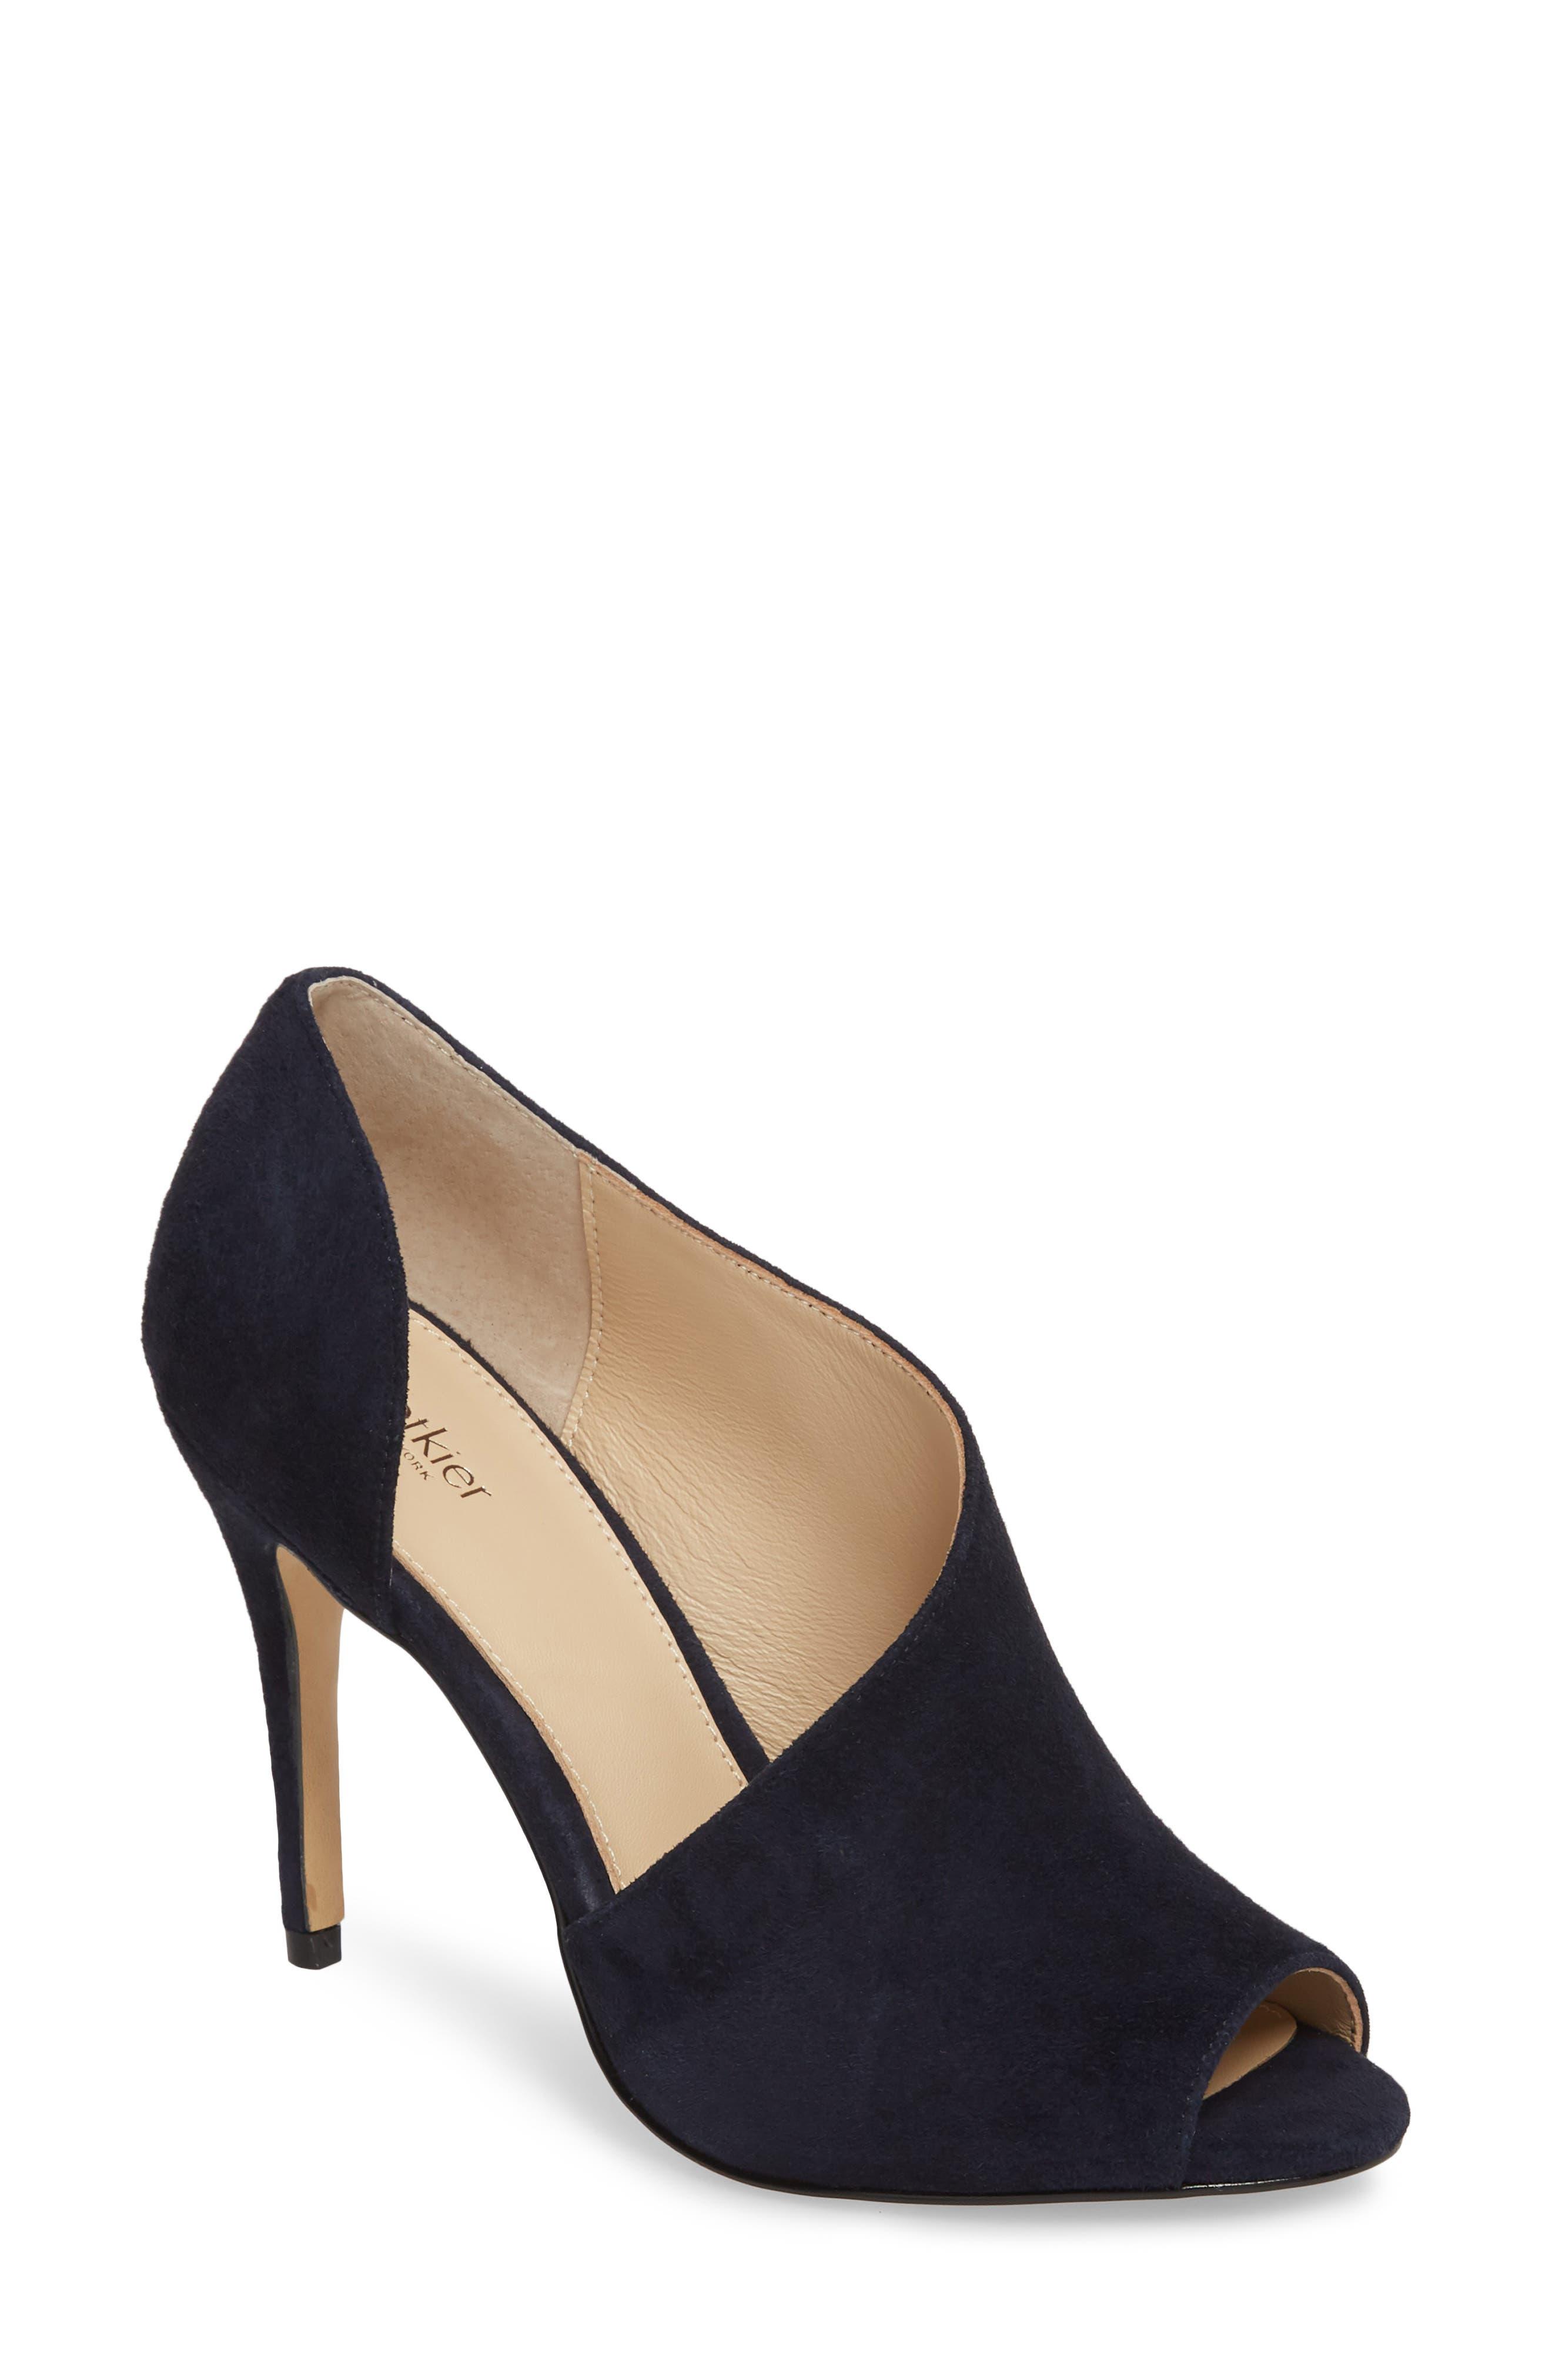 Adelia Asymmetrical Sandal,                         Main,                         color, Navy Suede